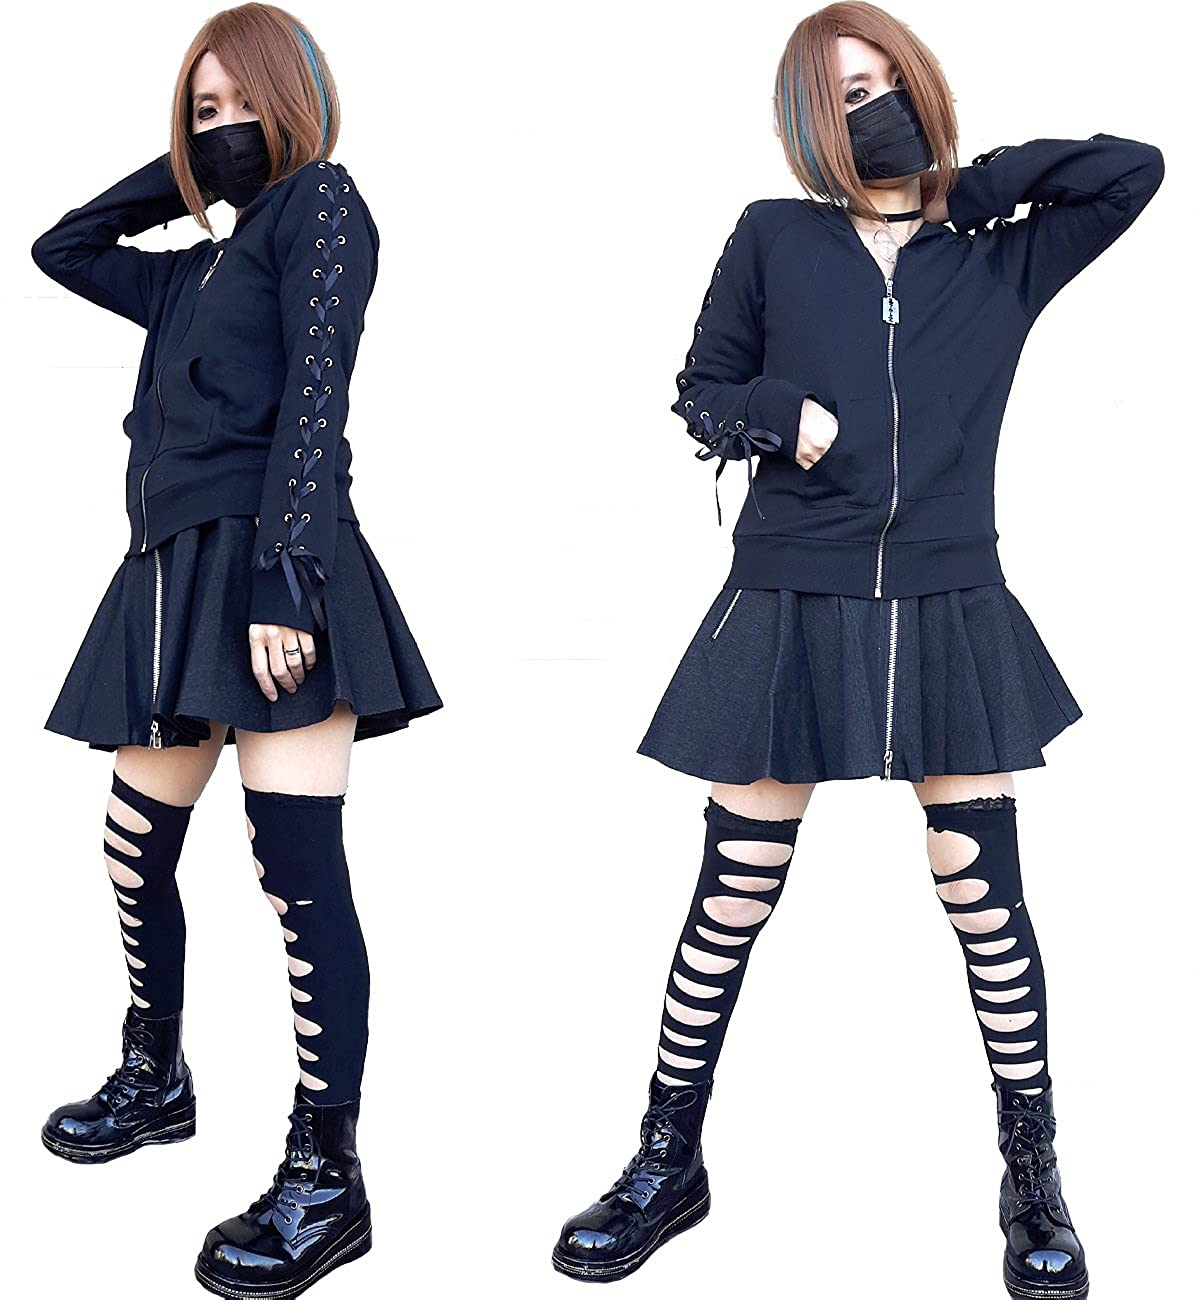 Hippies HELLCATPUNKS Womens Gothic Sweatshirts Hoodies Bone Coffin One Size PK-0019 Black